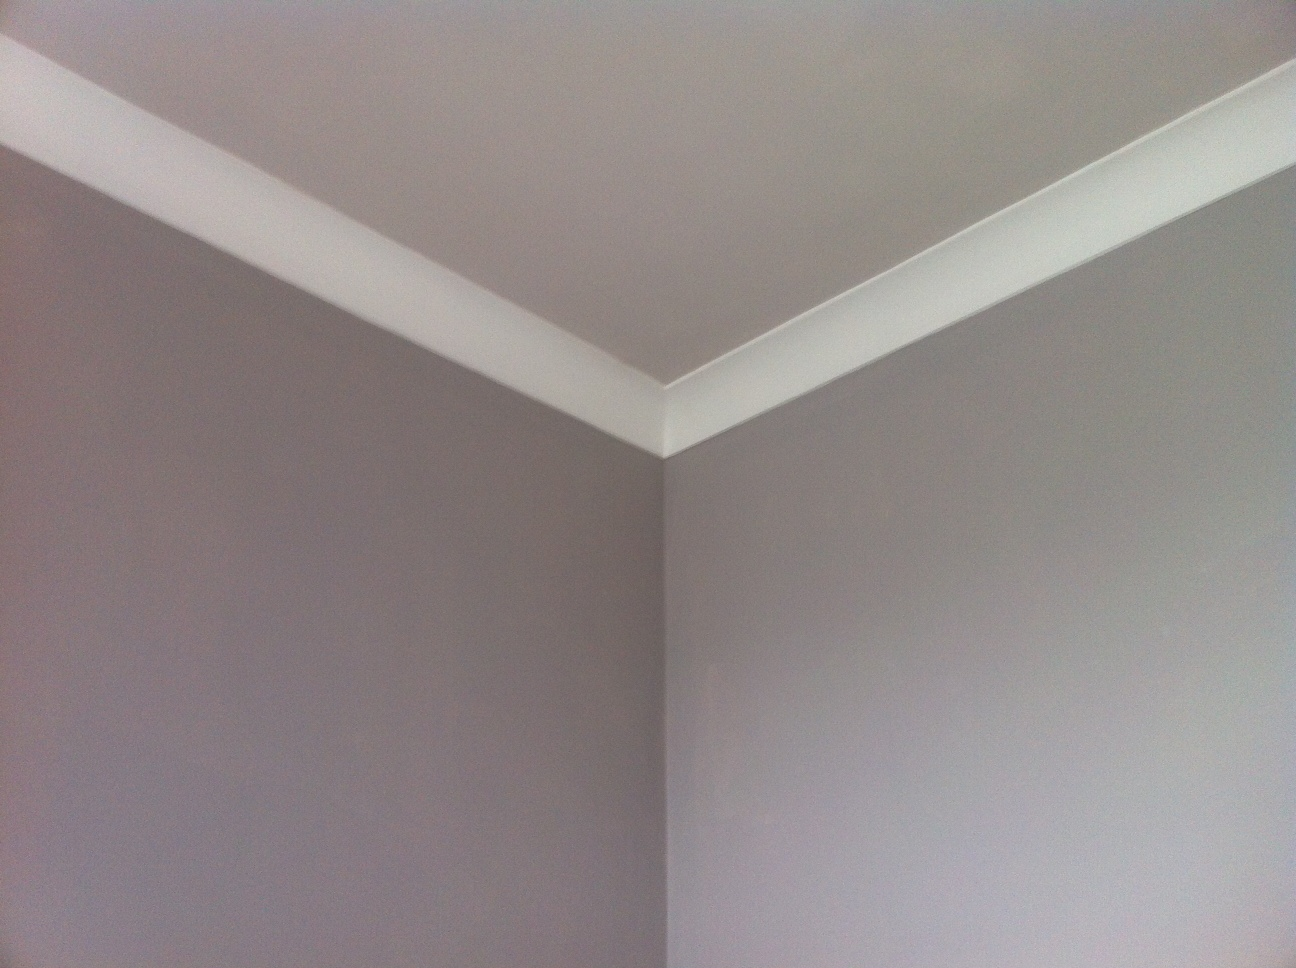 David Dangerous My Grey Ceiling And Grey Walls